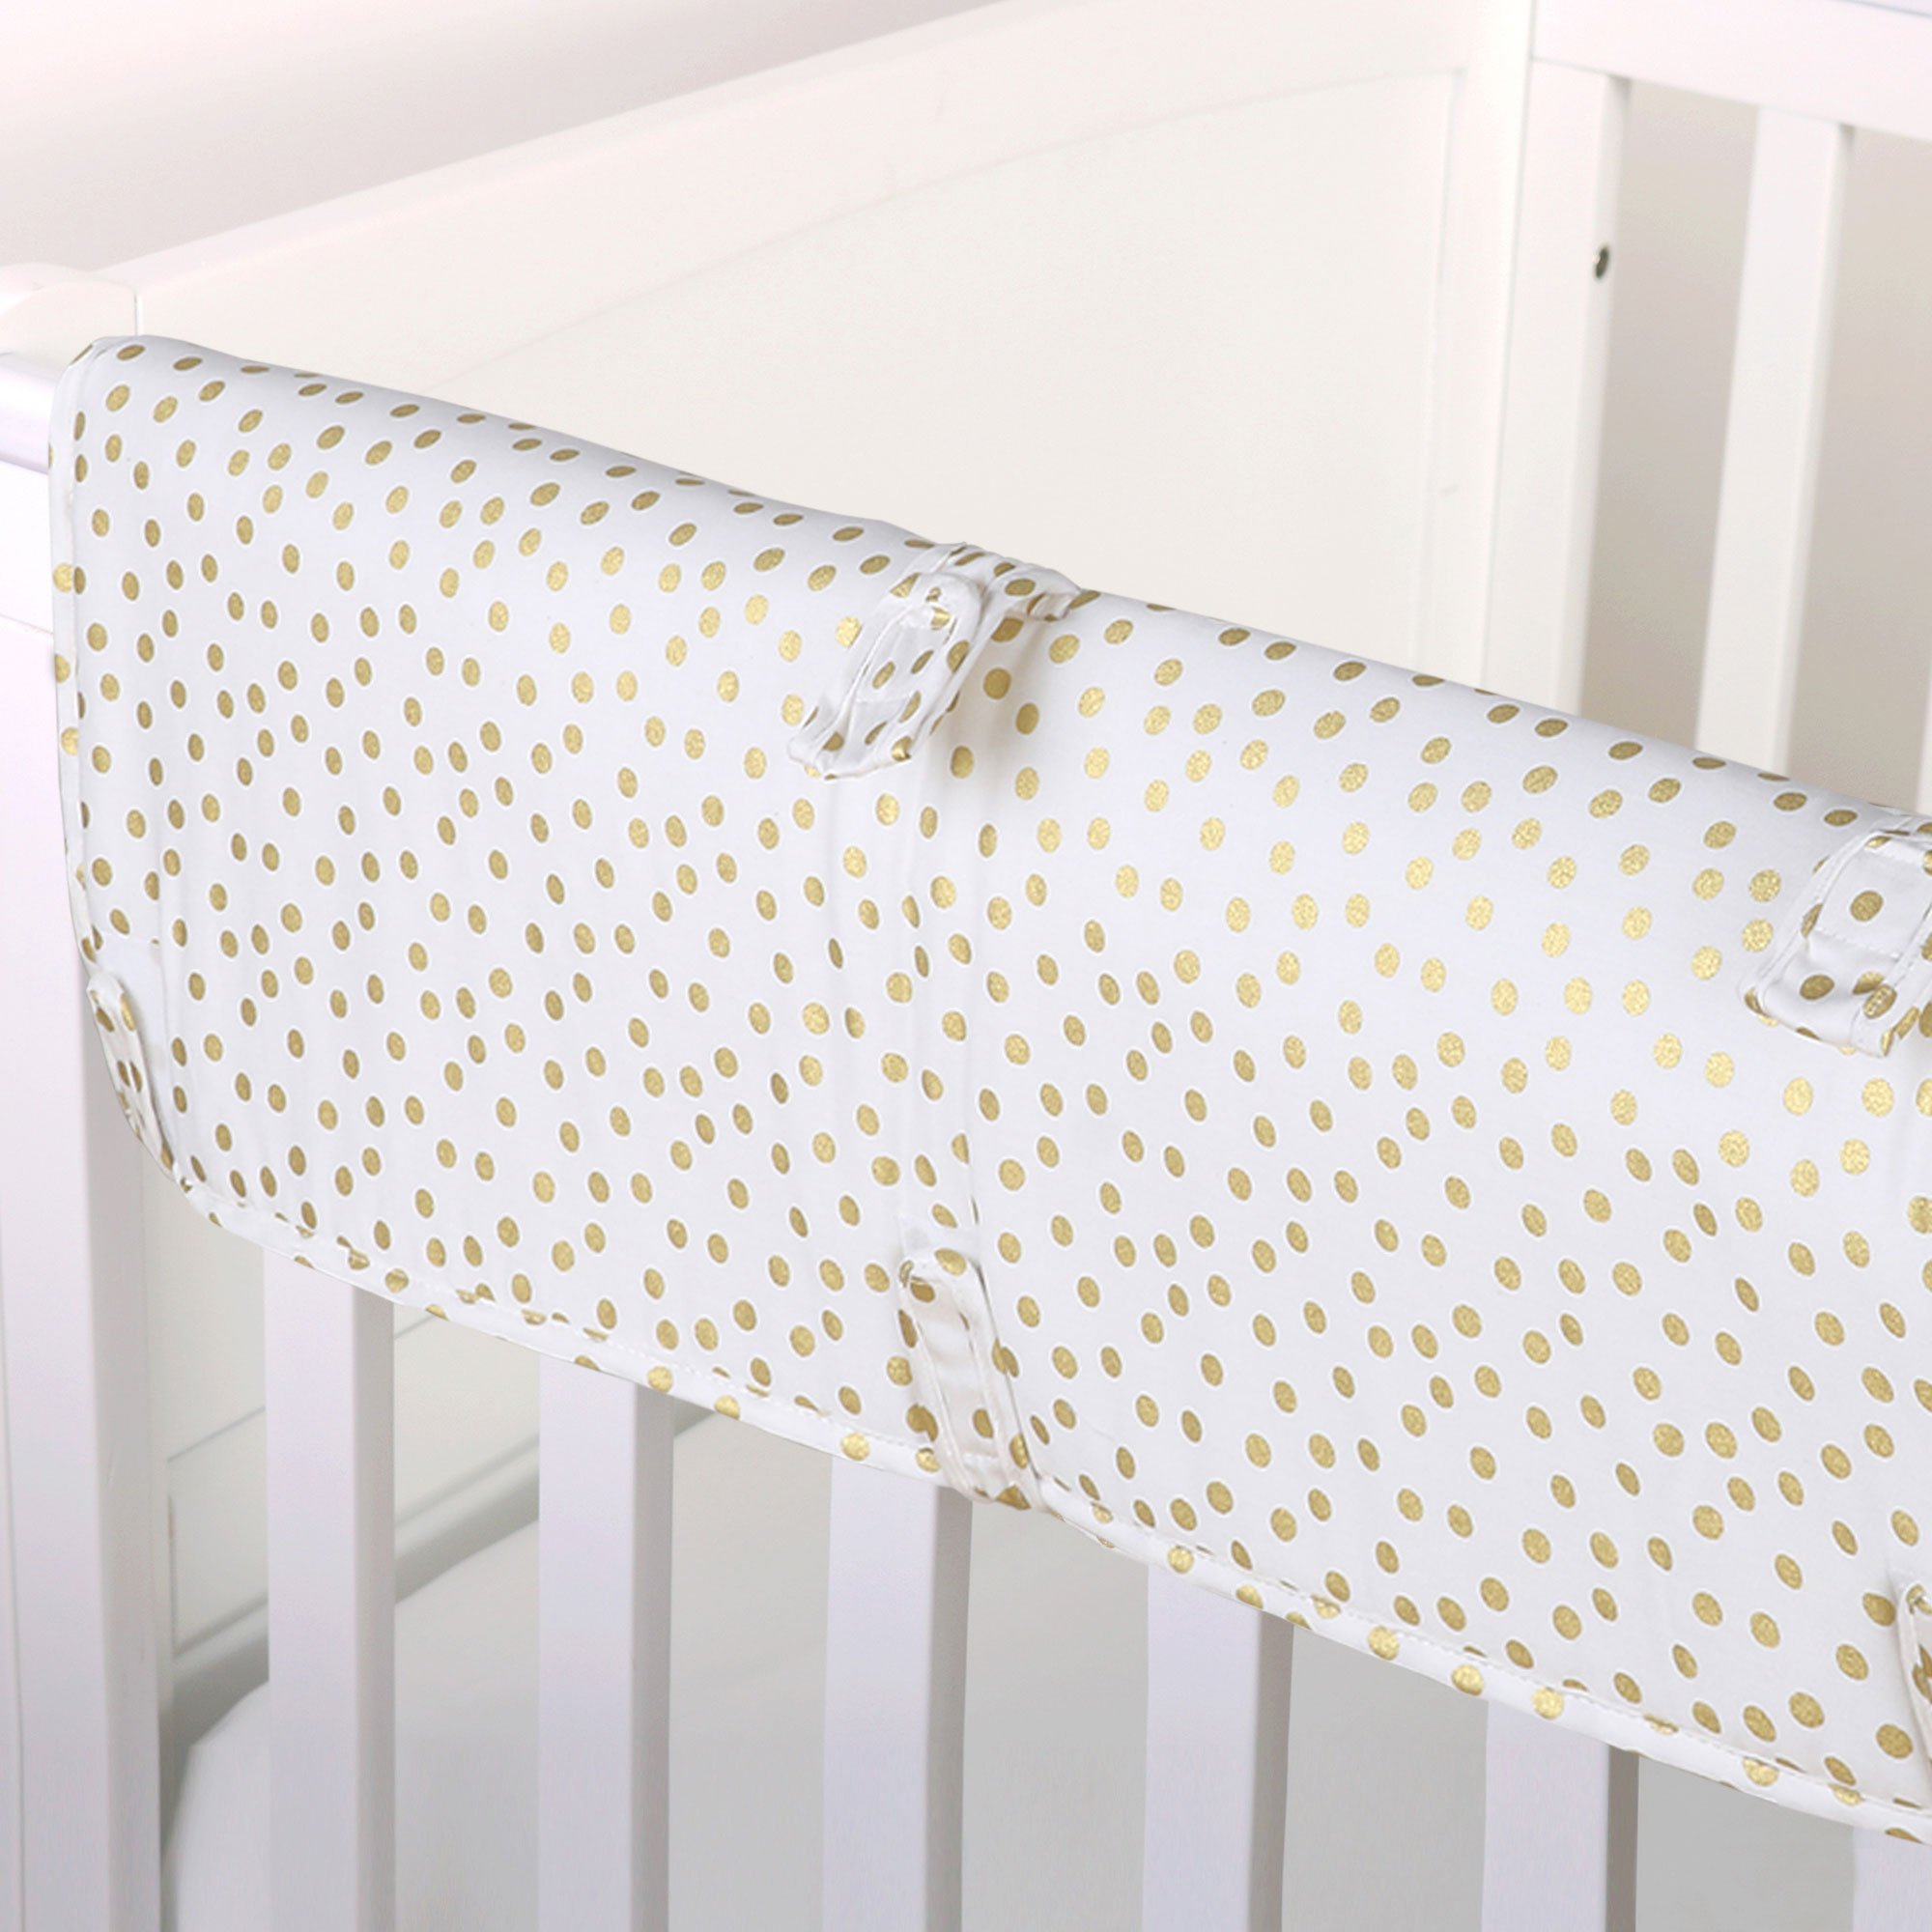 Gold Confetti Dot Print 100% Cotton Padded Crib Rail Guard by The Peanut Shell